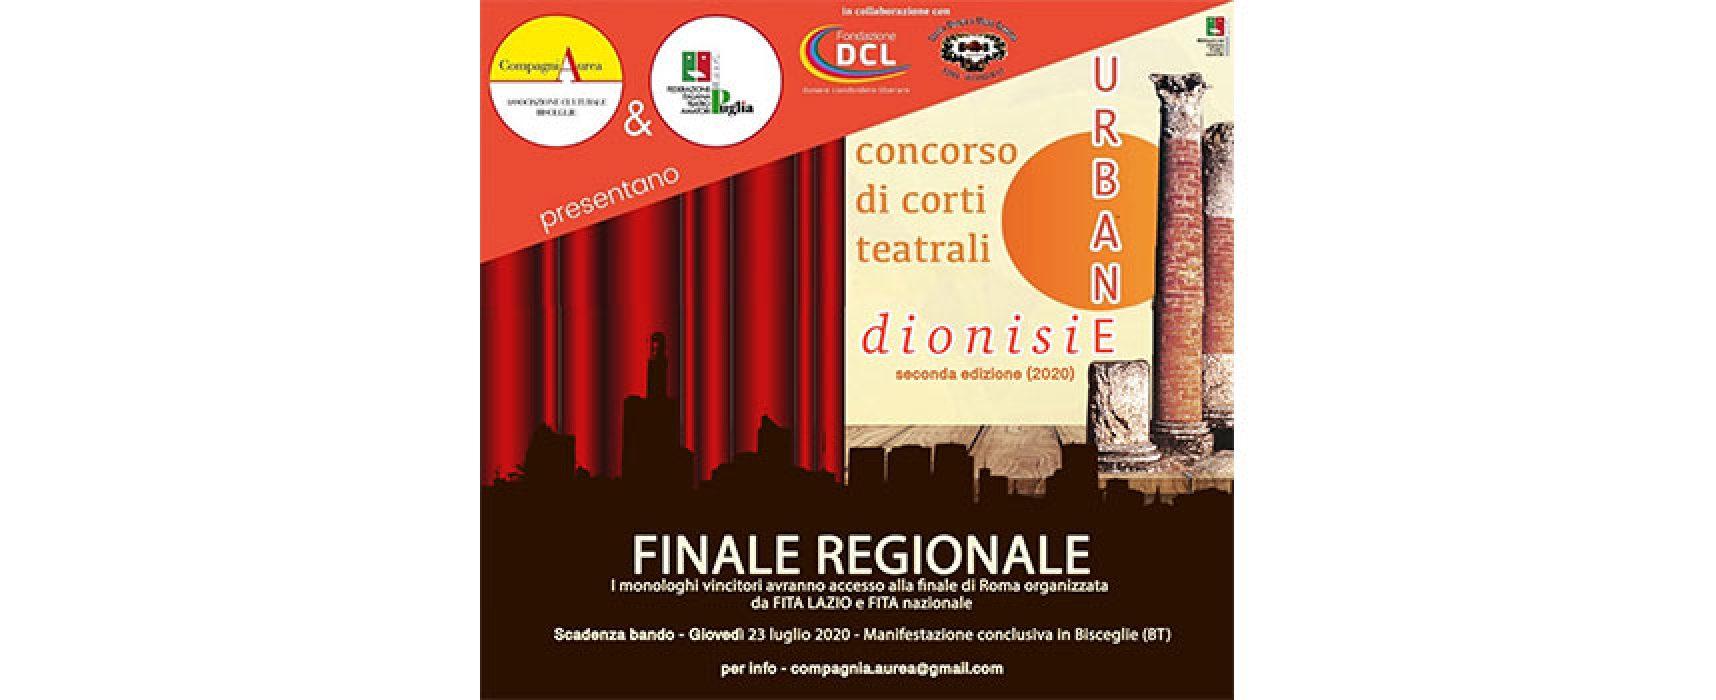 A Bisceglie la seconda edizione di Dionisie Urbane / DETTAGLI